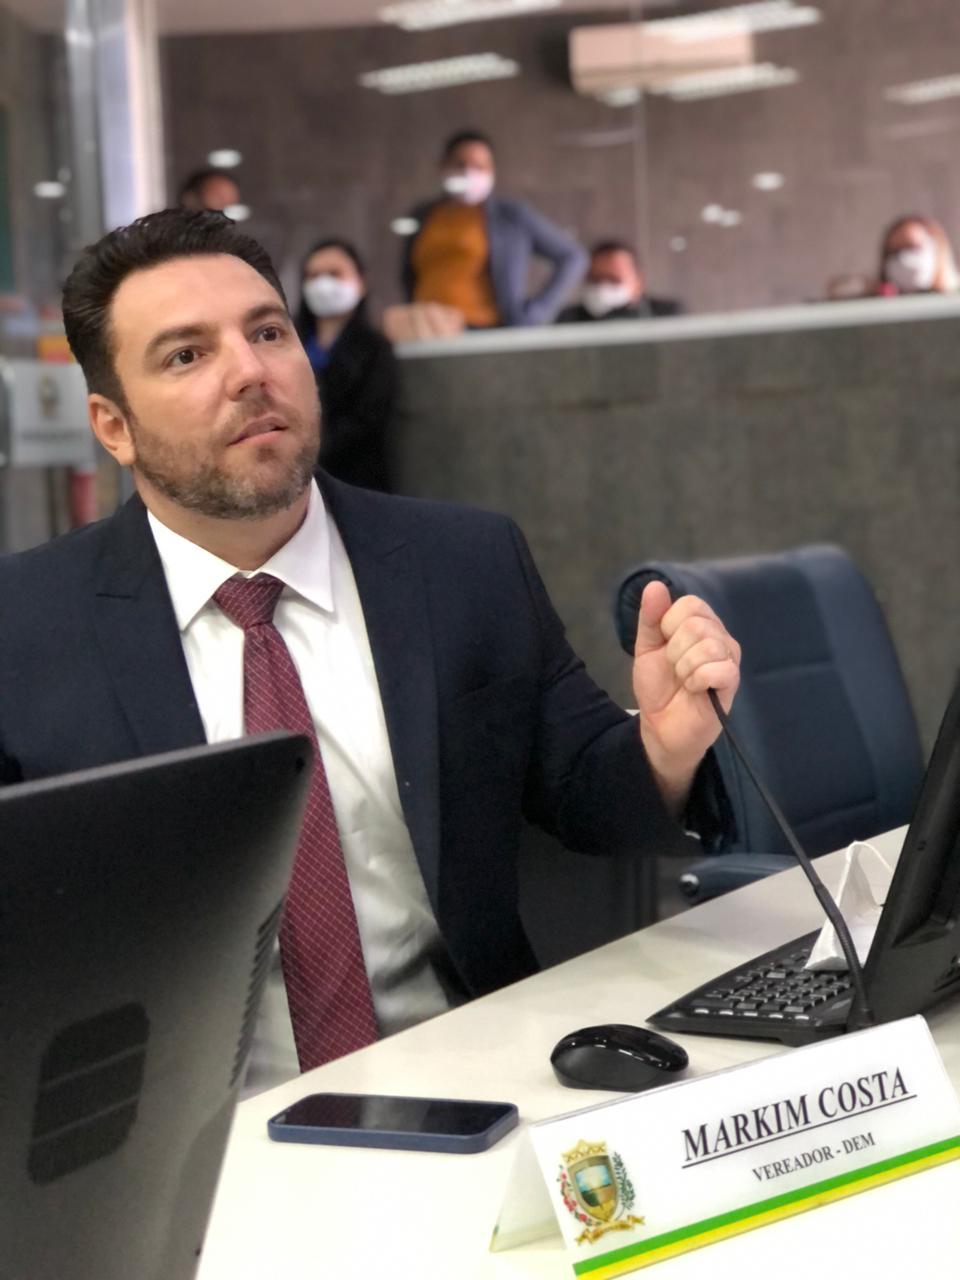 Vereador Markim Costa vai apresentar indicativo de Projeto de Lei